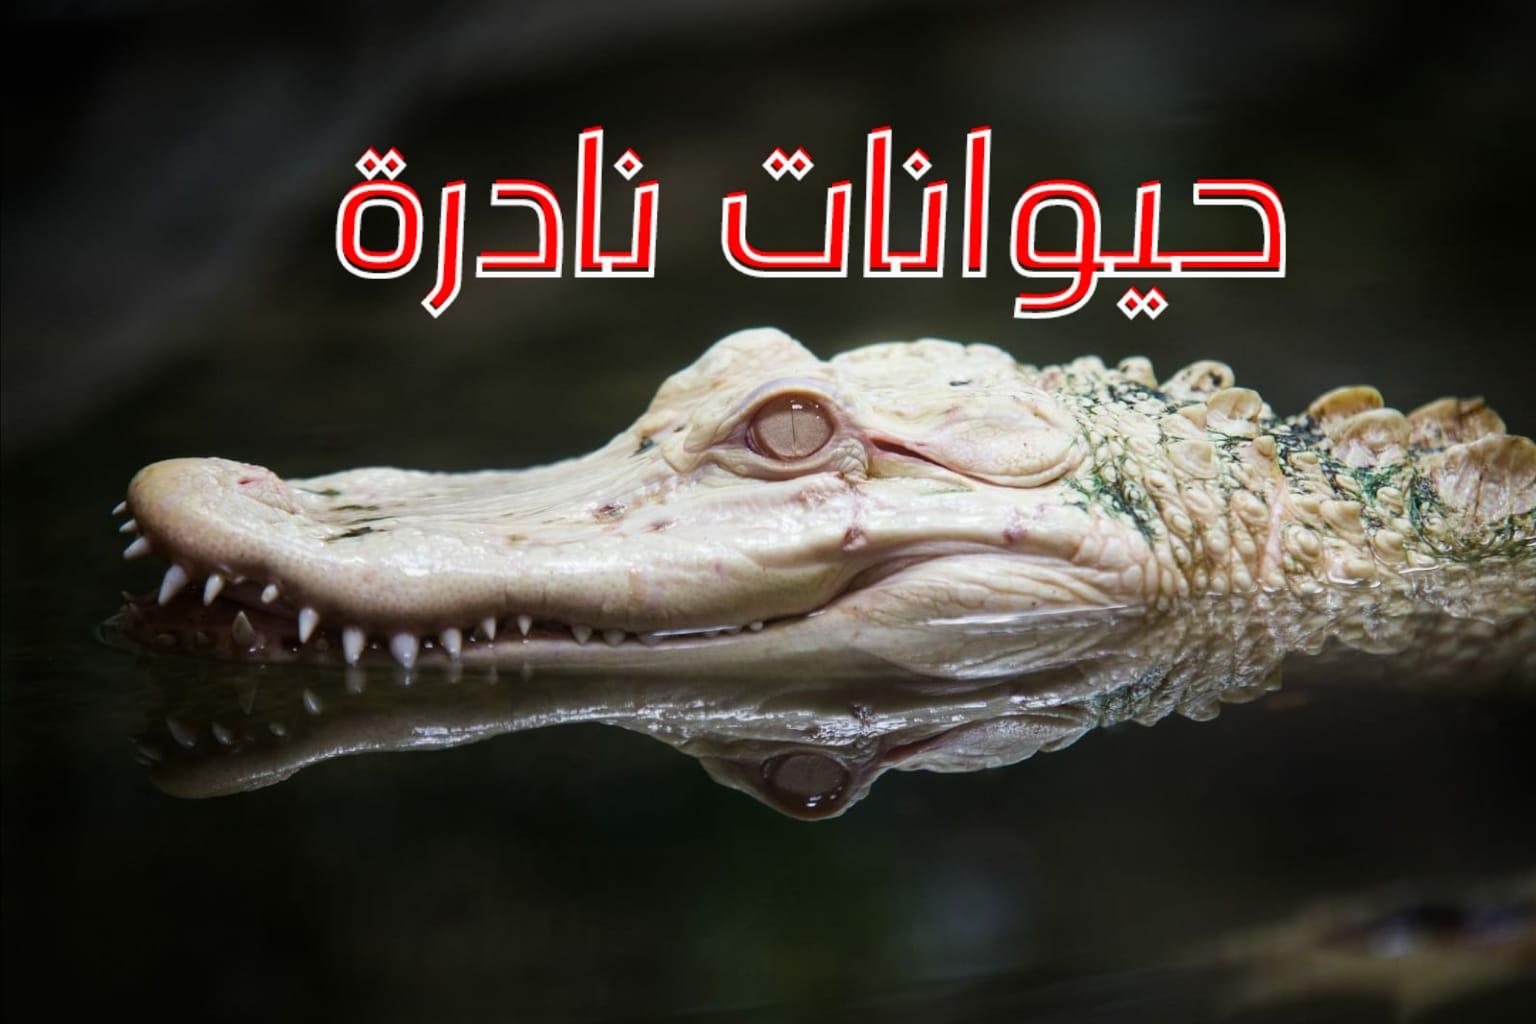 WhatsApp Image 2020 06 08 at 11.45.43 PM - أغرب وأندر الحيوانات في العالم